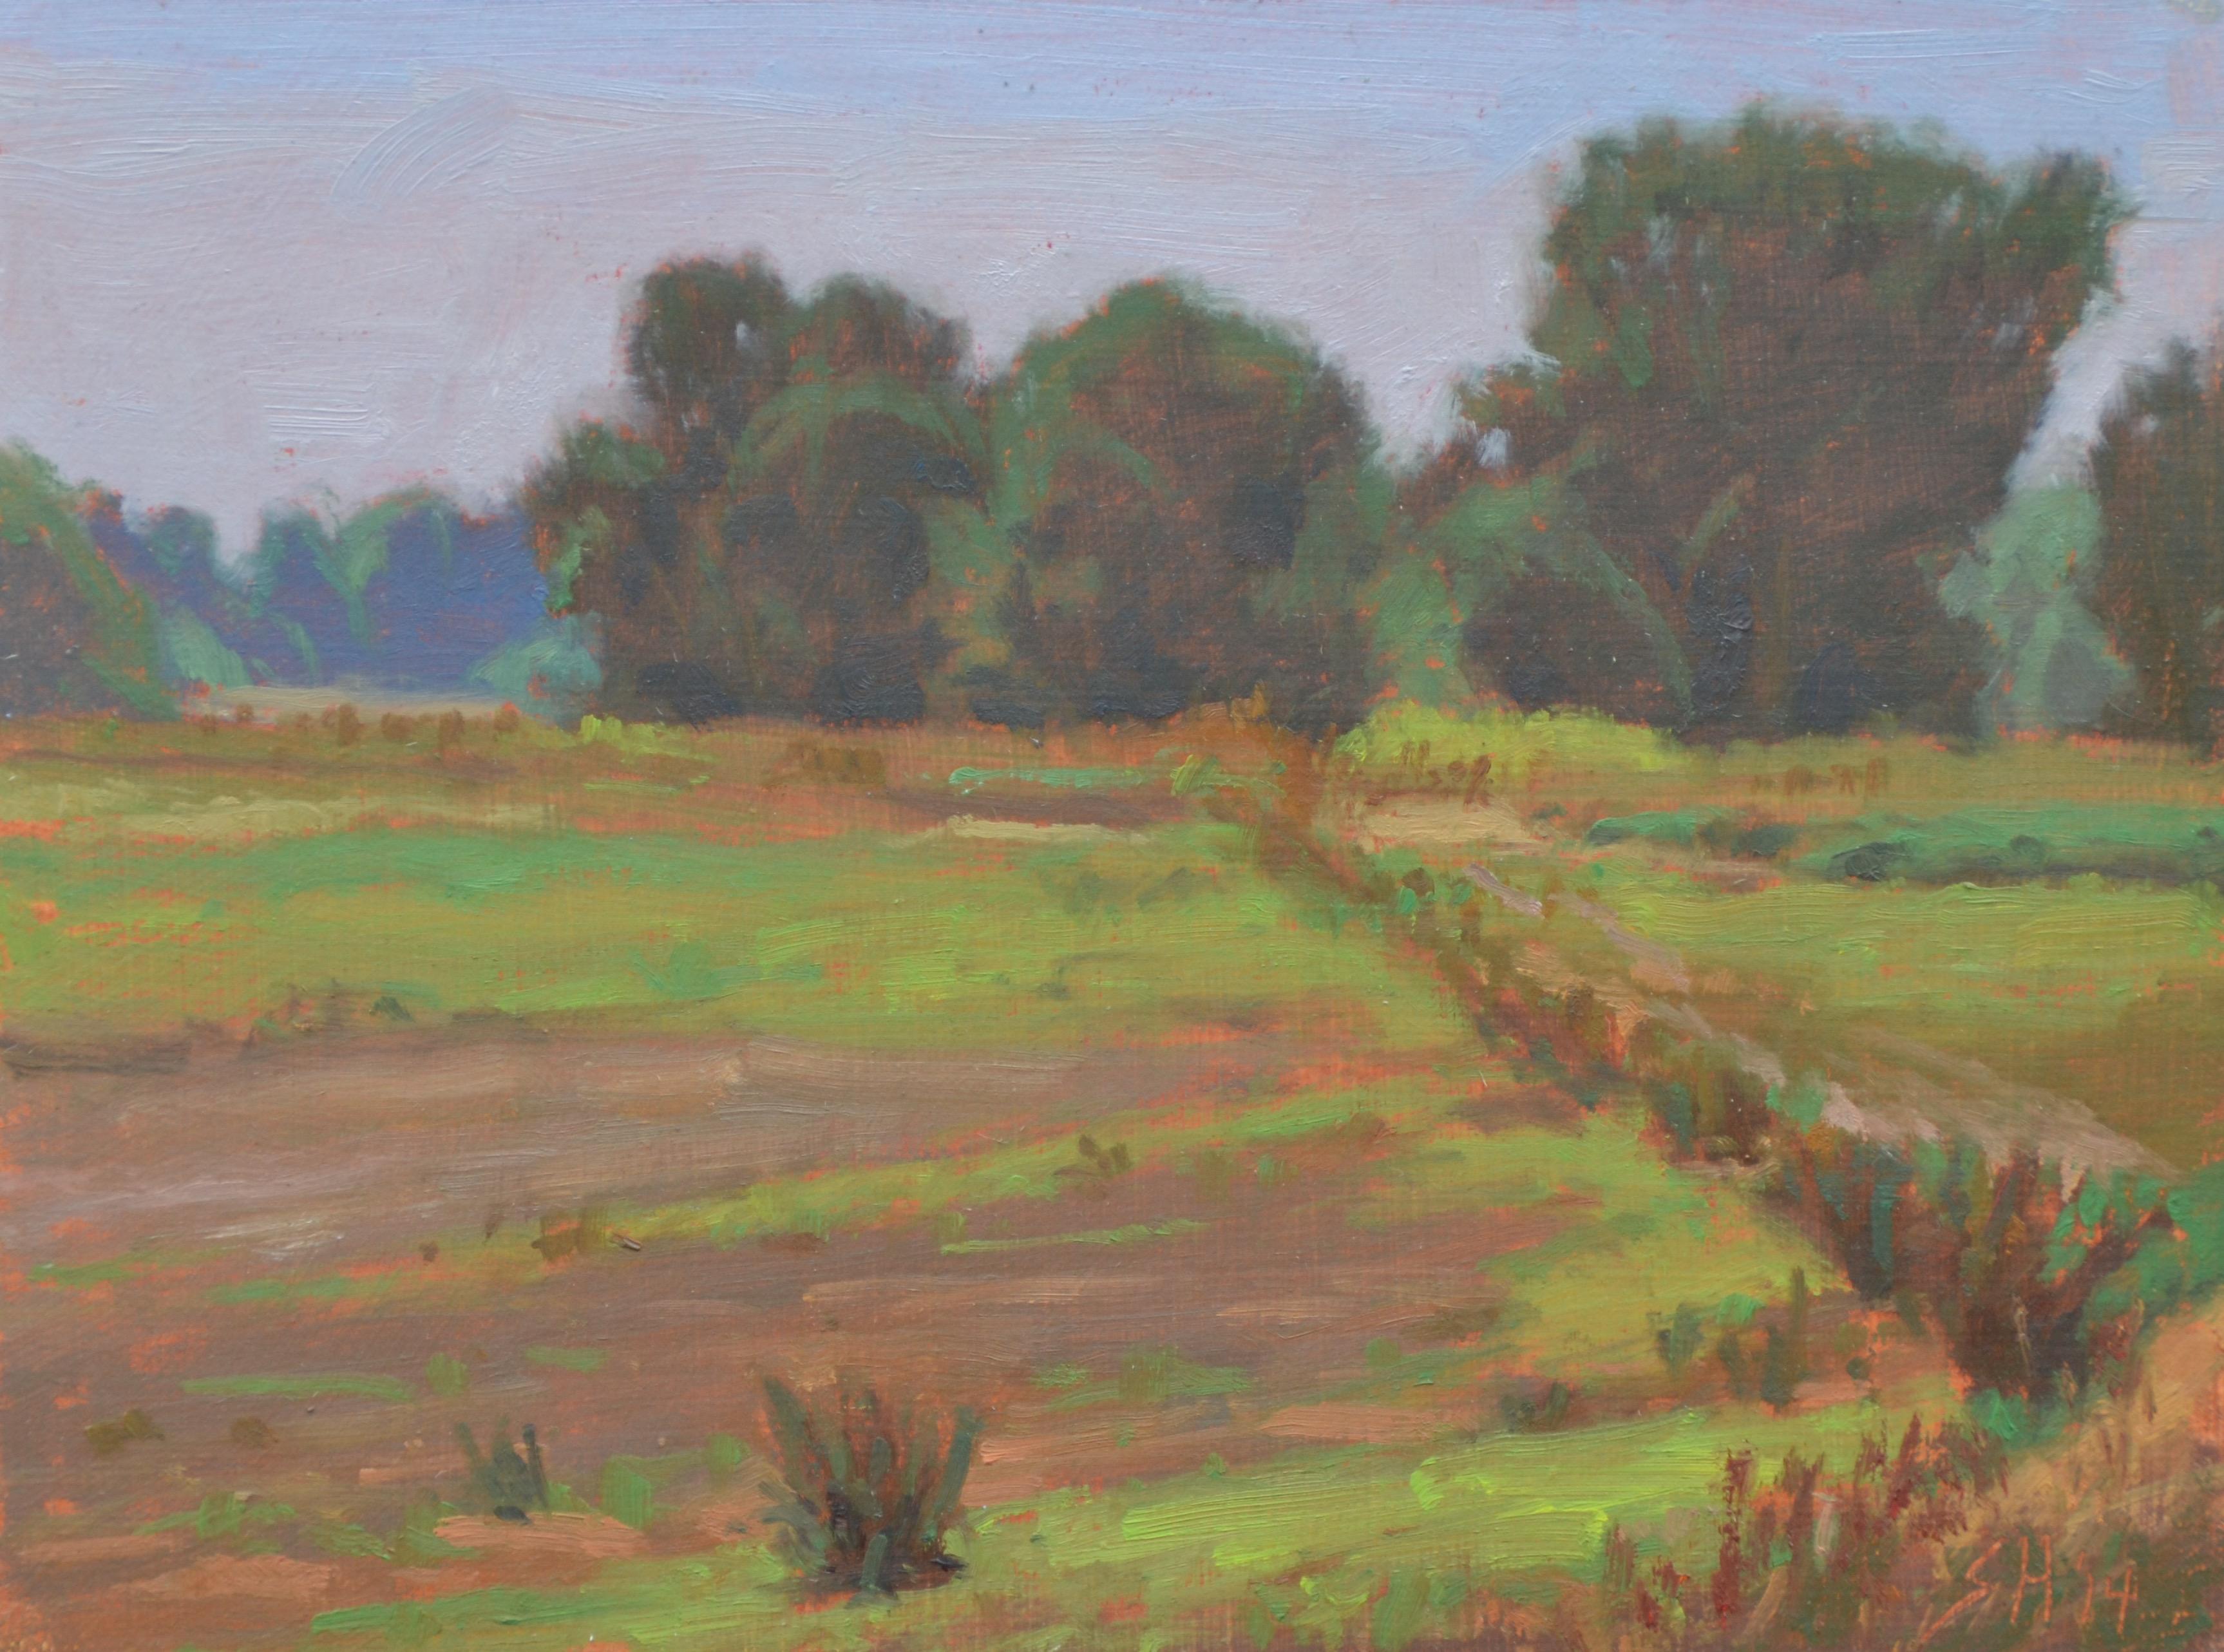 Greeley Pasture